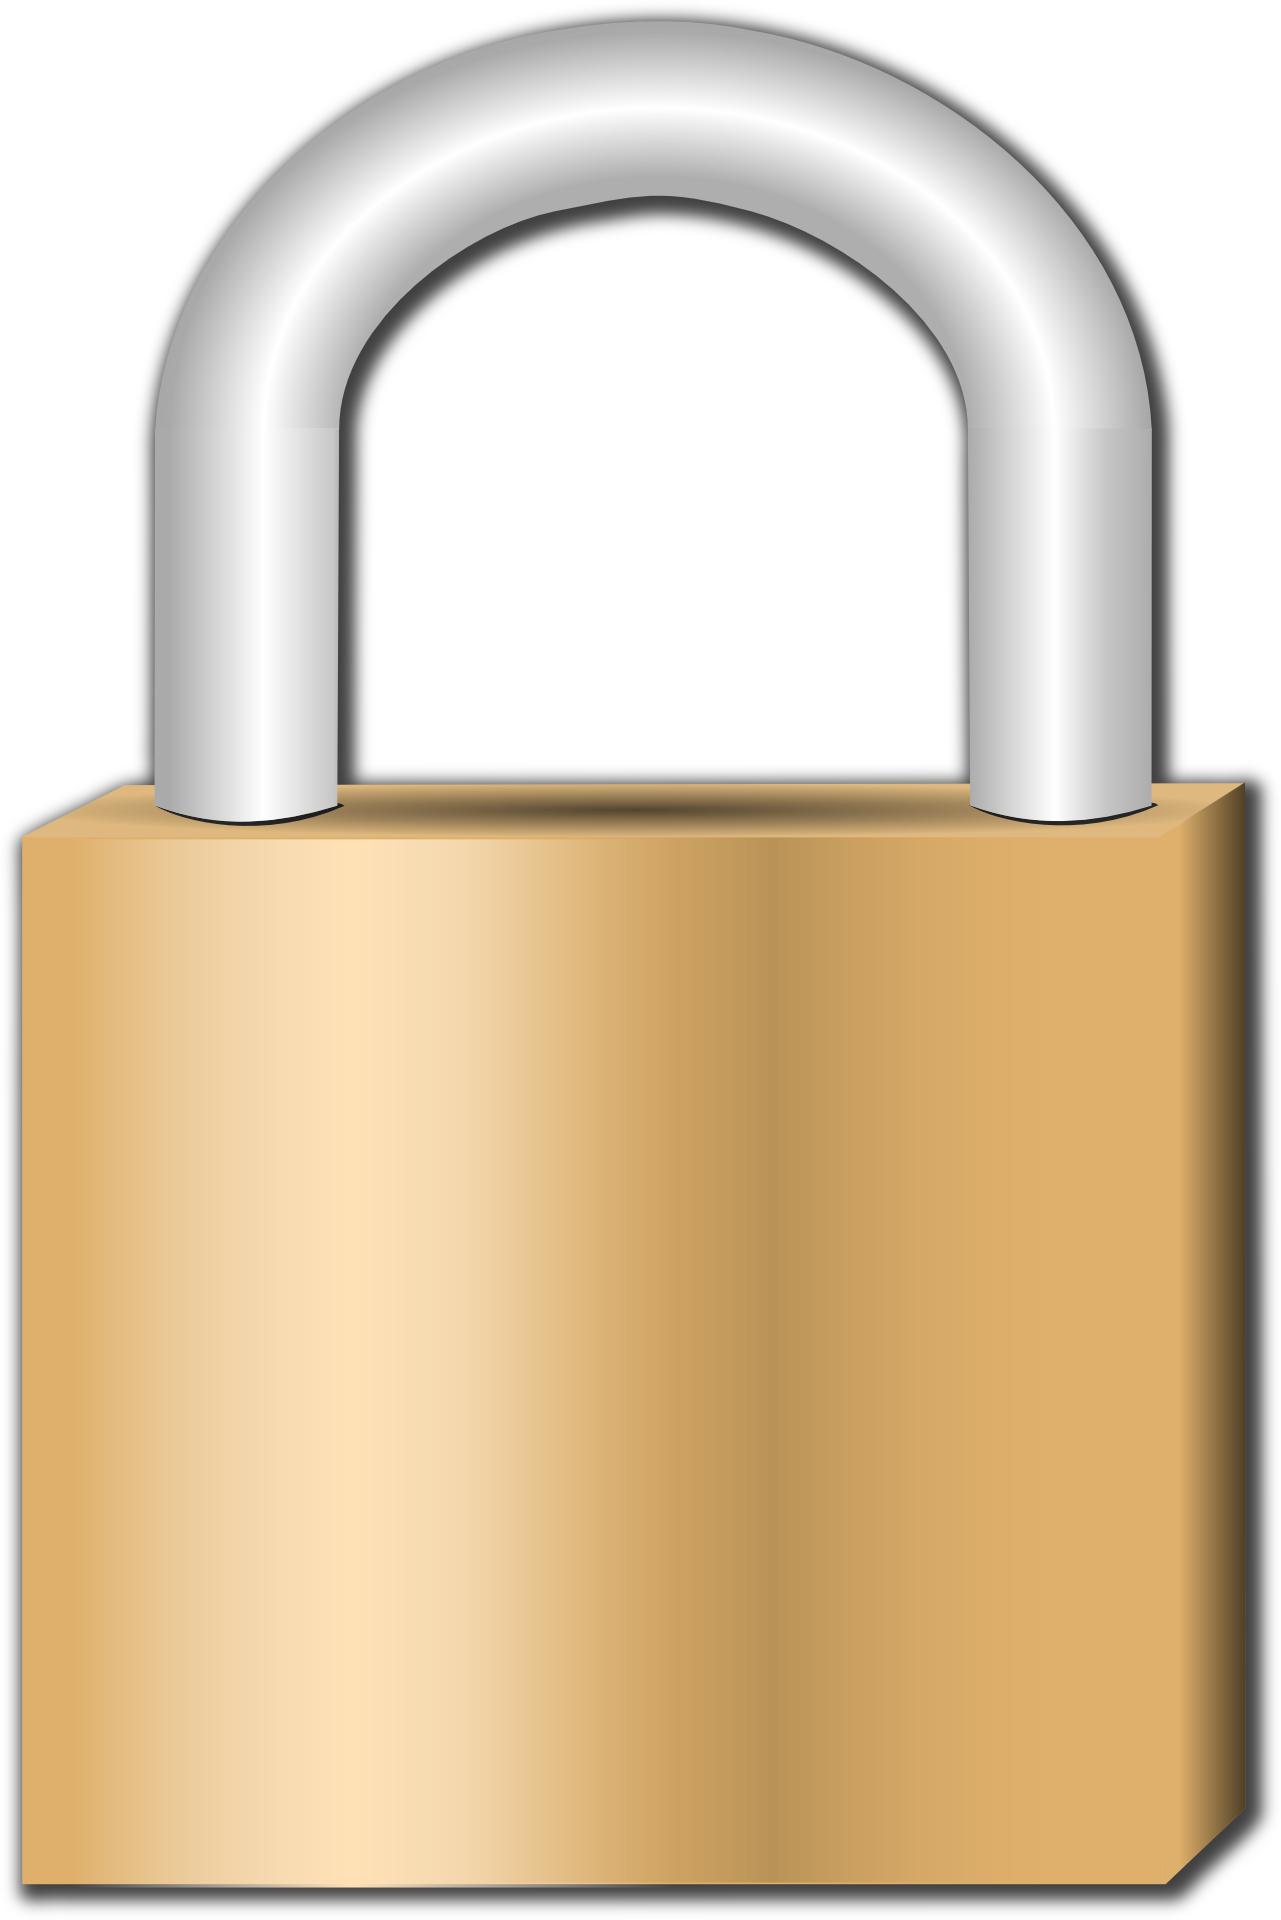 safety lock icon vector